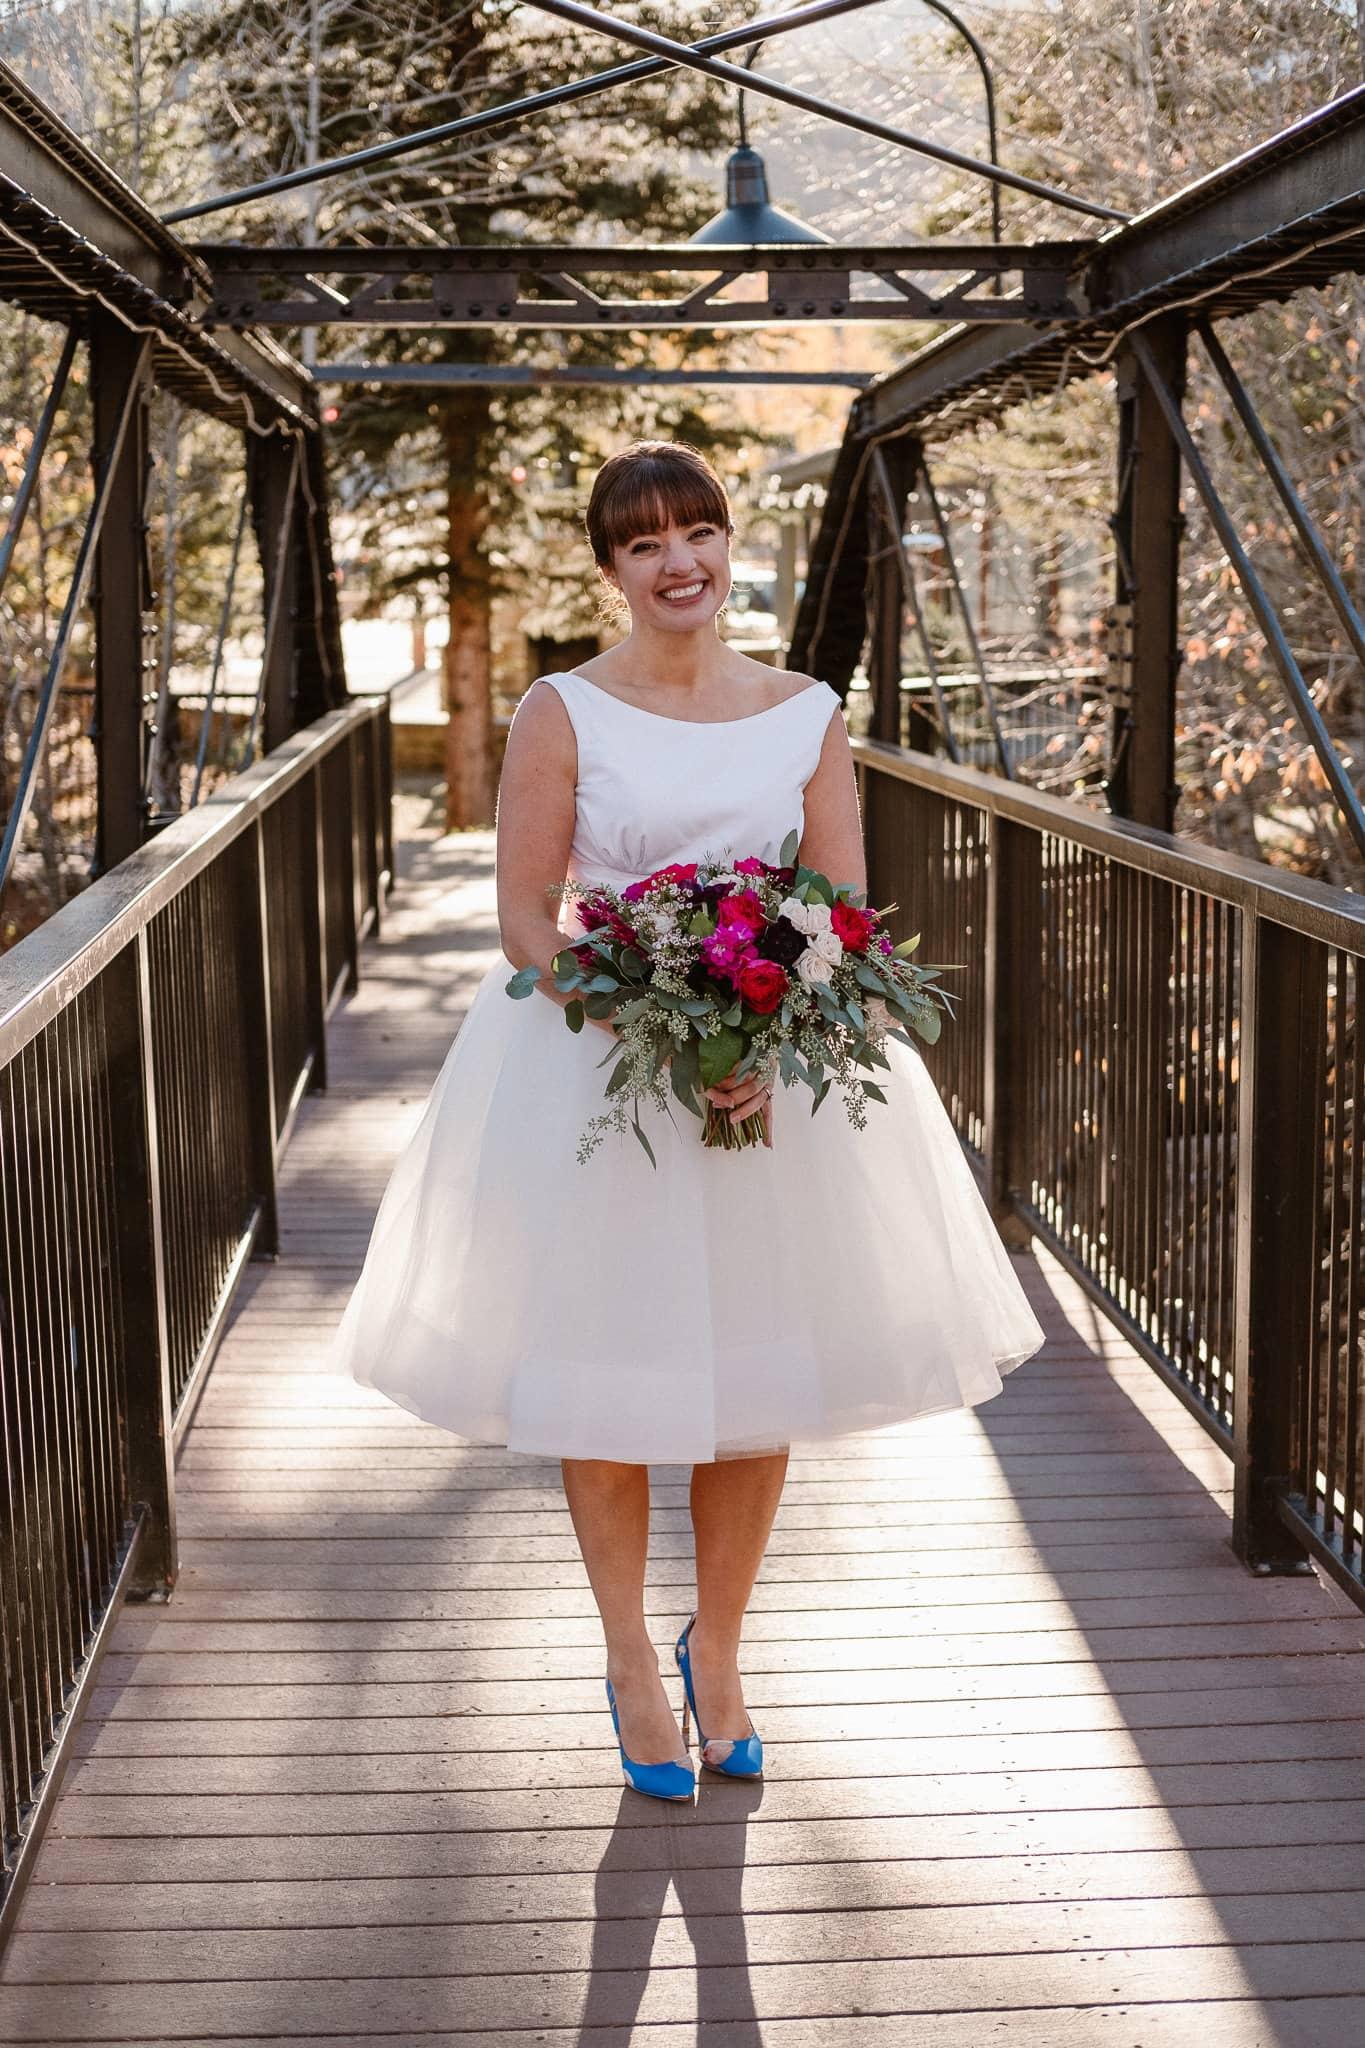 Silverthorne Pavilion wedding photography, Colorado wedding photographer, bride portrait, classic Audrey Hepburn style wedding dress